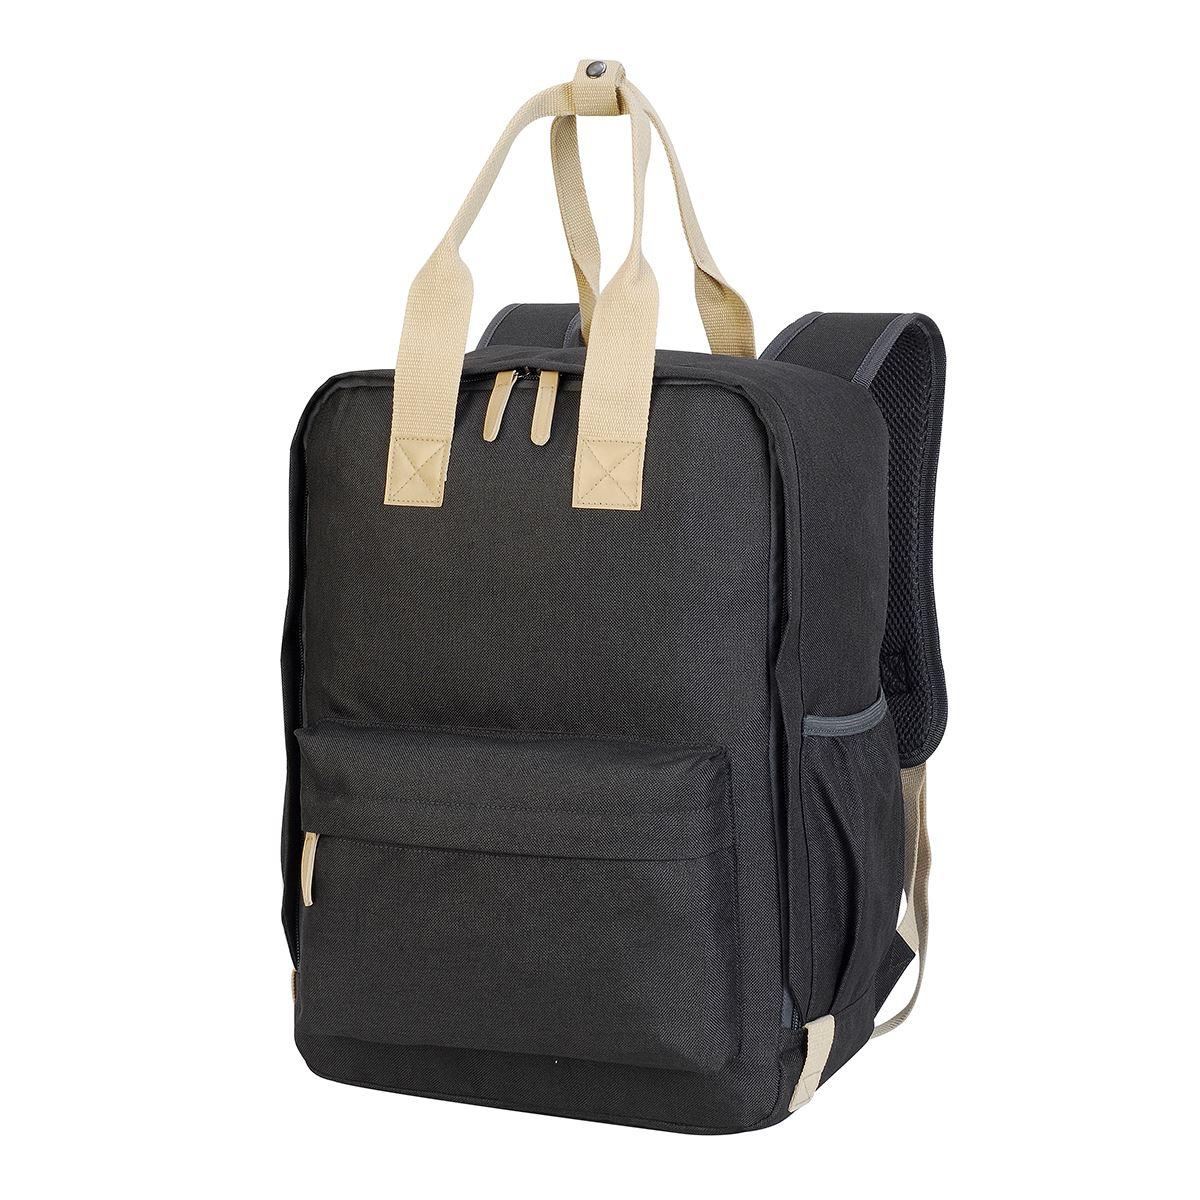 7693 nottingham backpack shugon bags leather goods promotional picture of 7693 nottingham backpack charcoal melange reheart Images